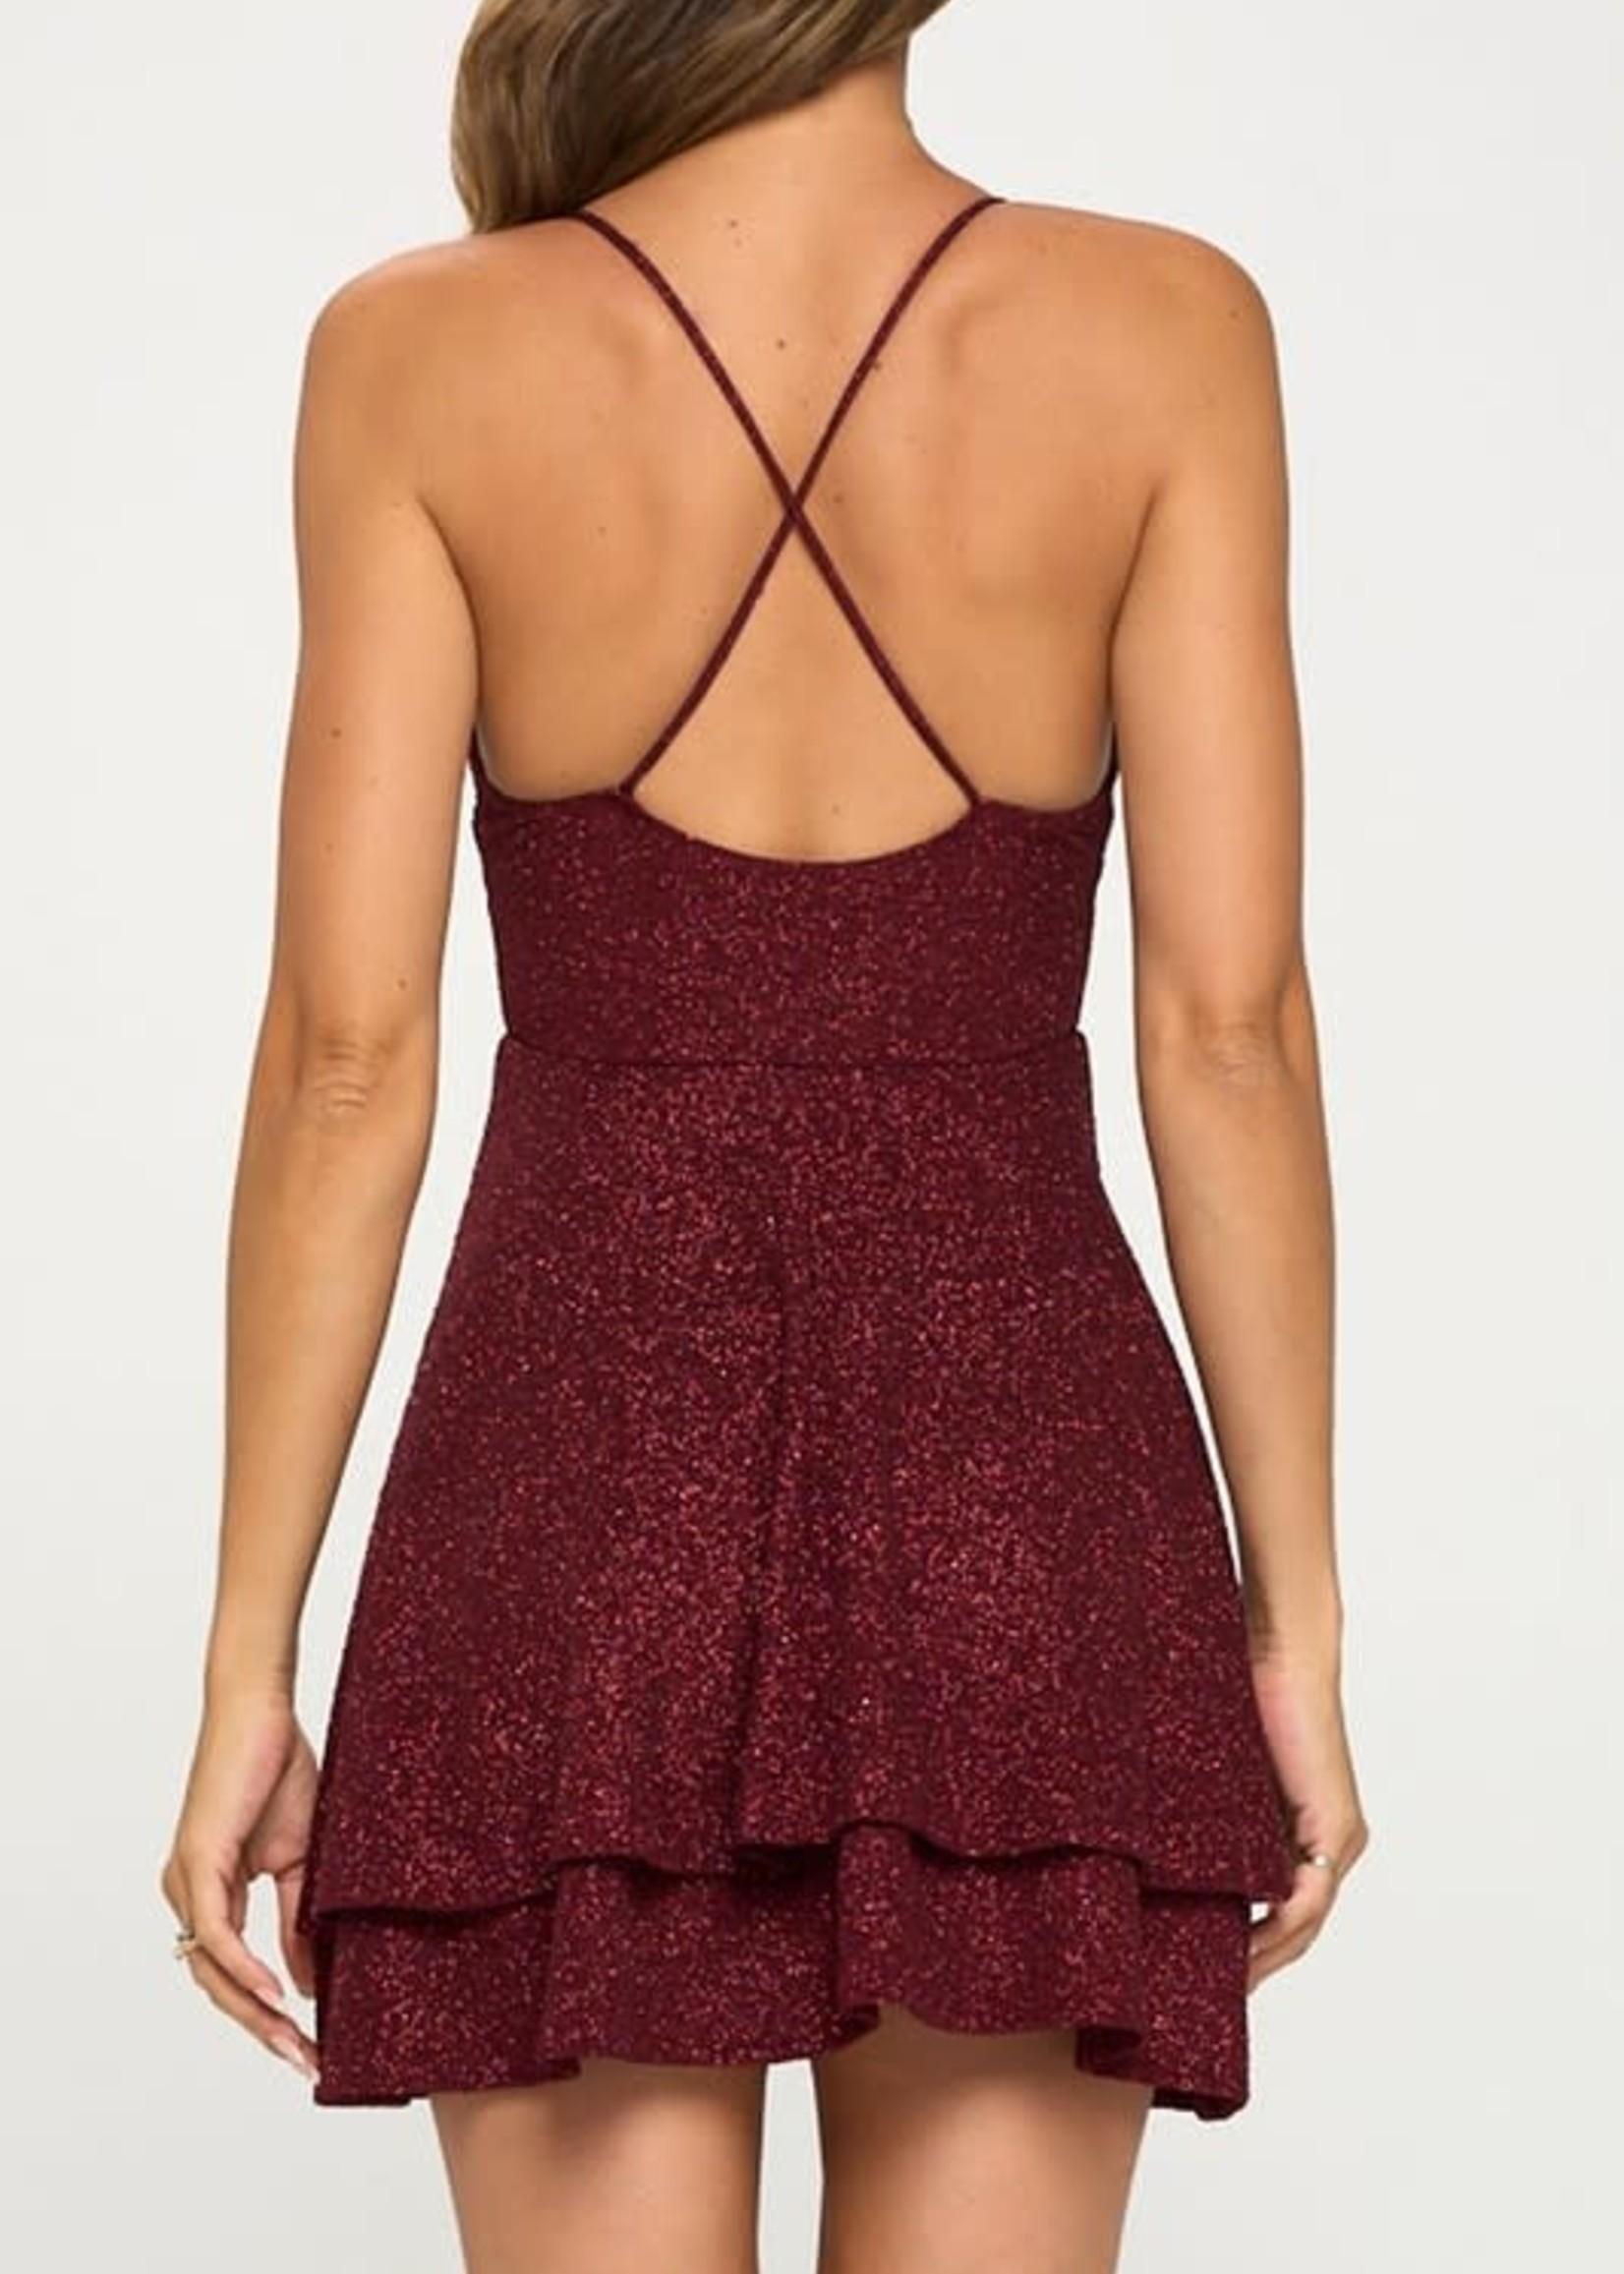 Sparkle All Night Burgundy Dress